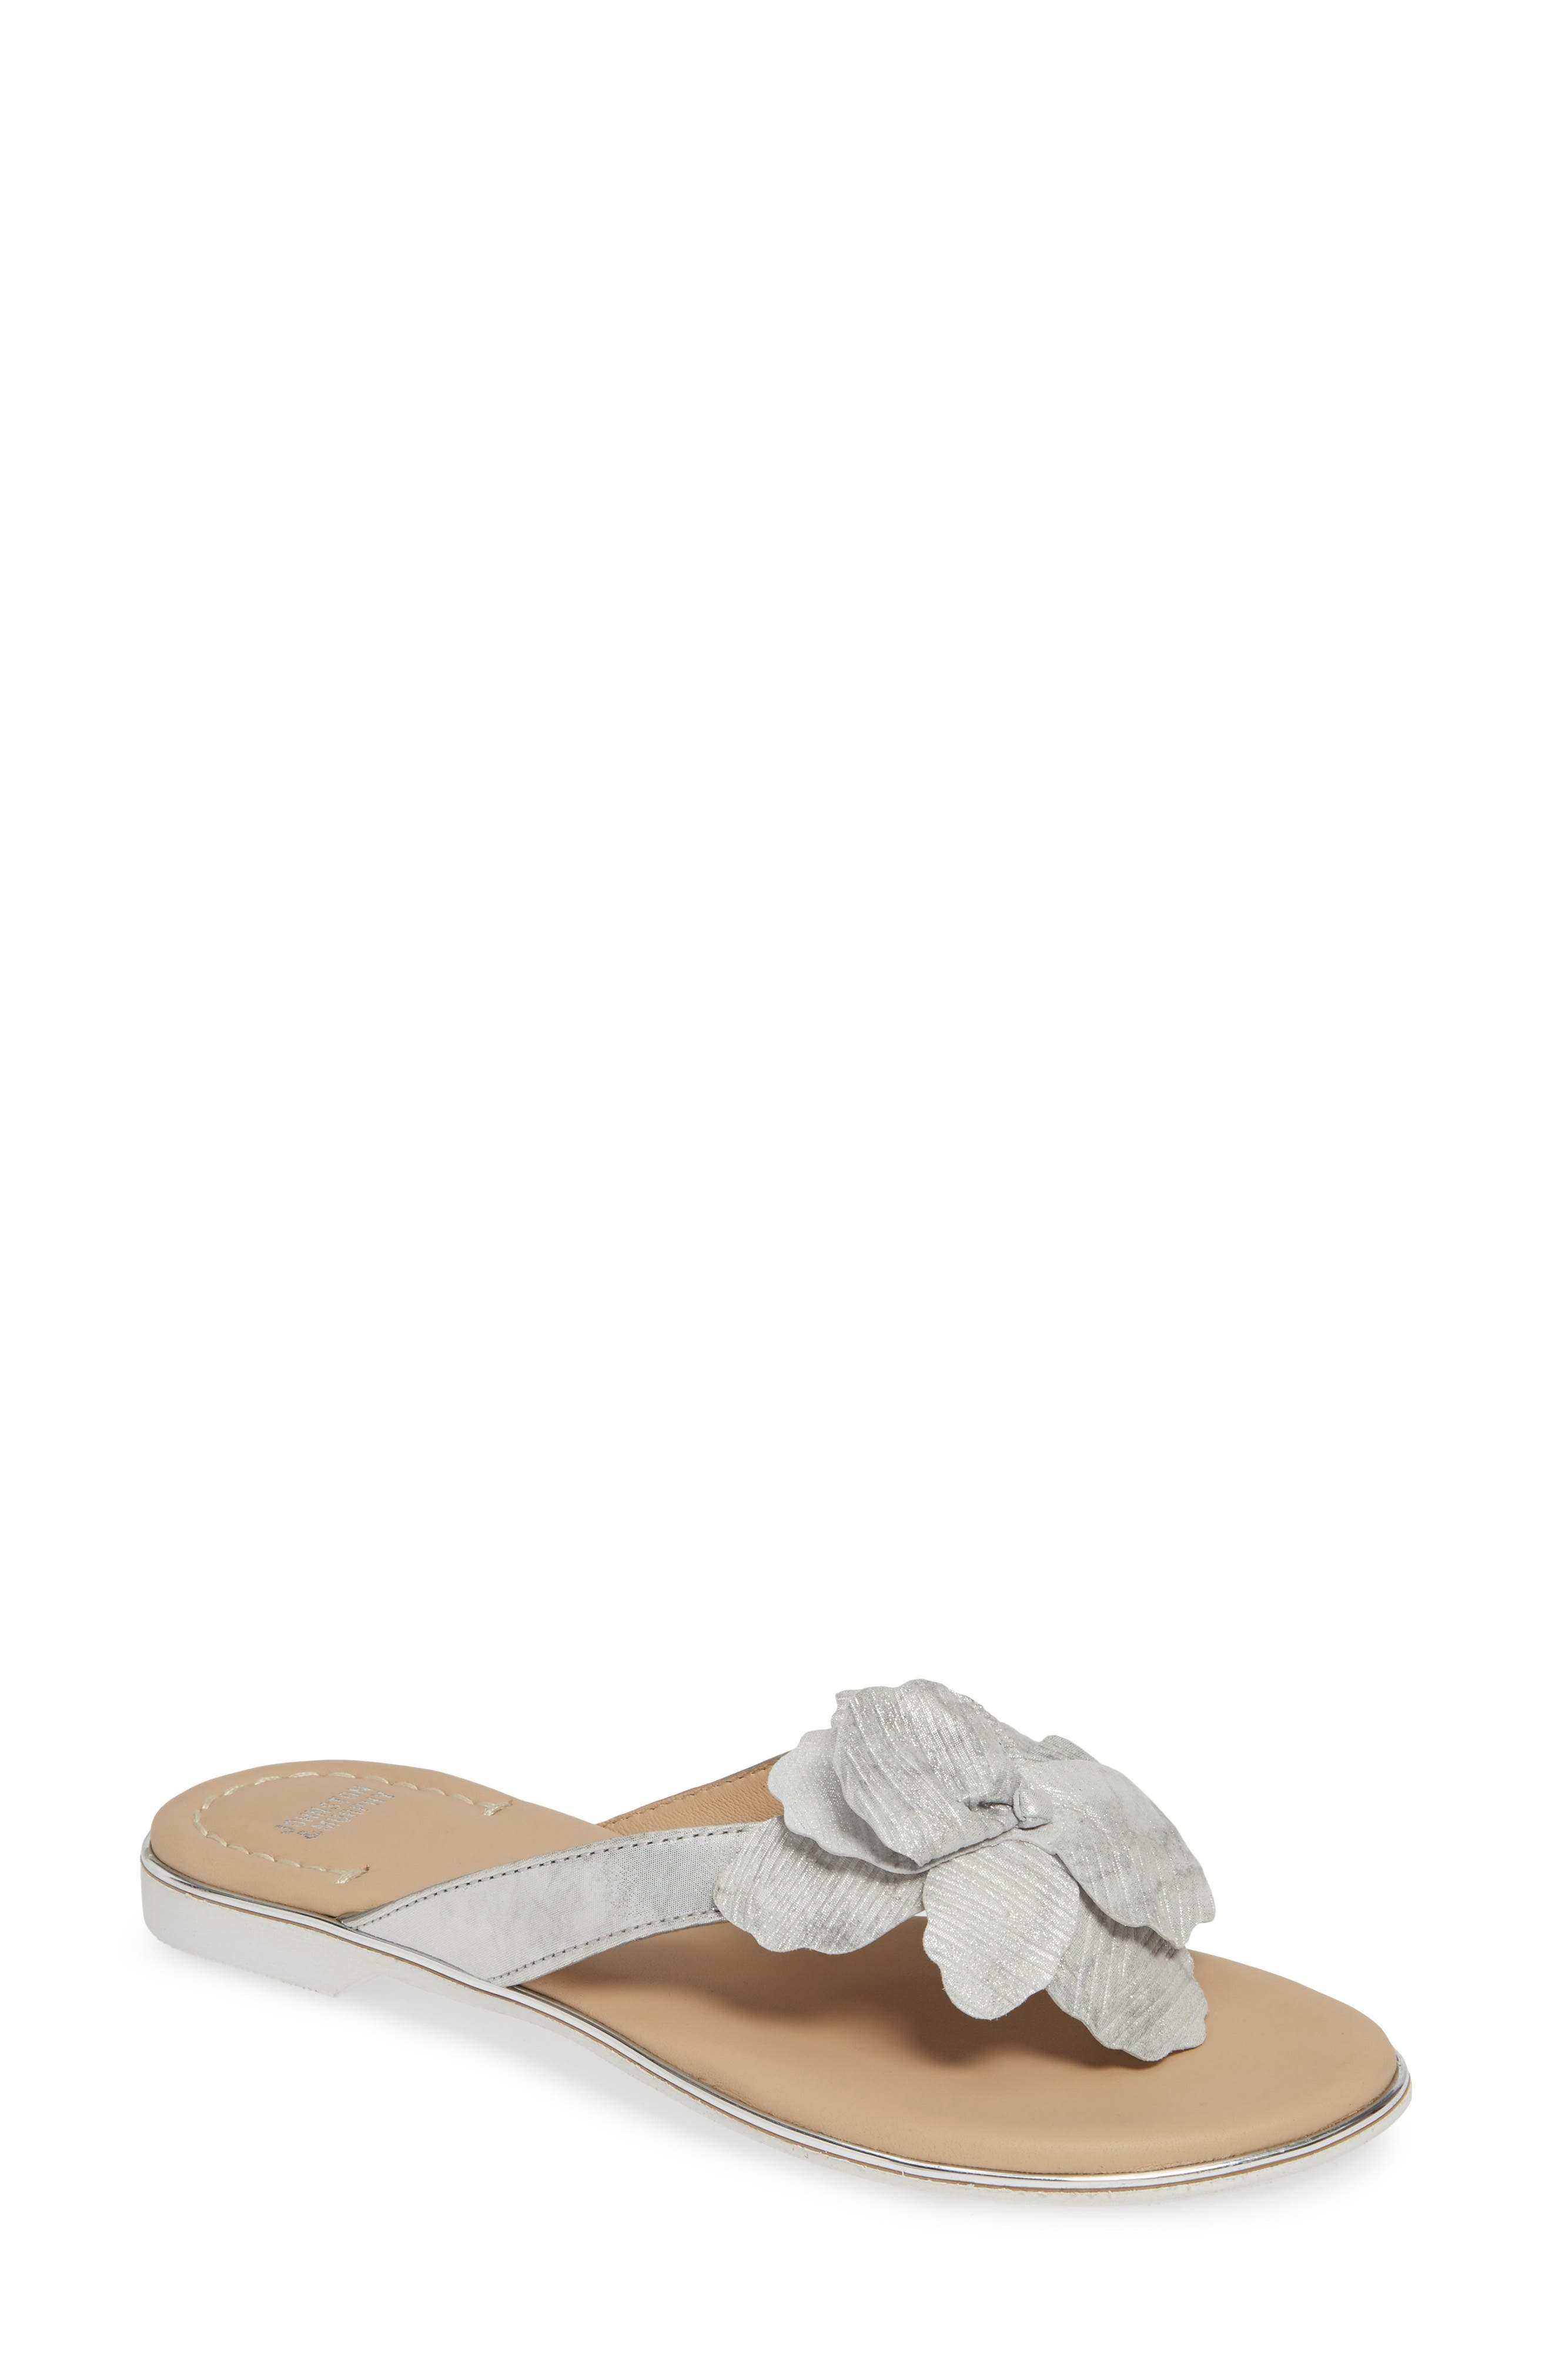 Johnston & Murphy Reanne Flip Flop- Metallic